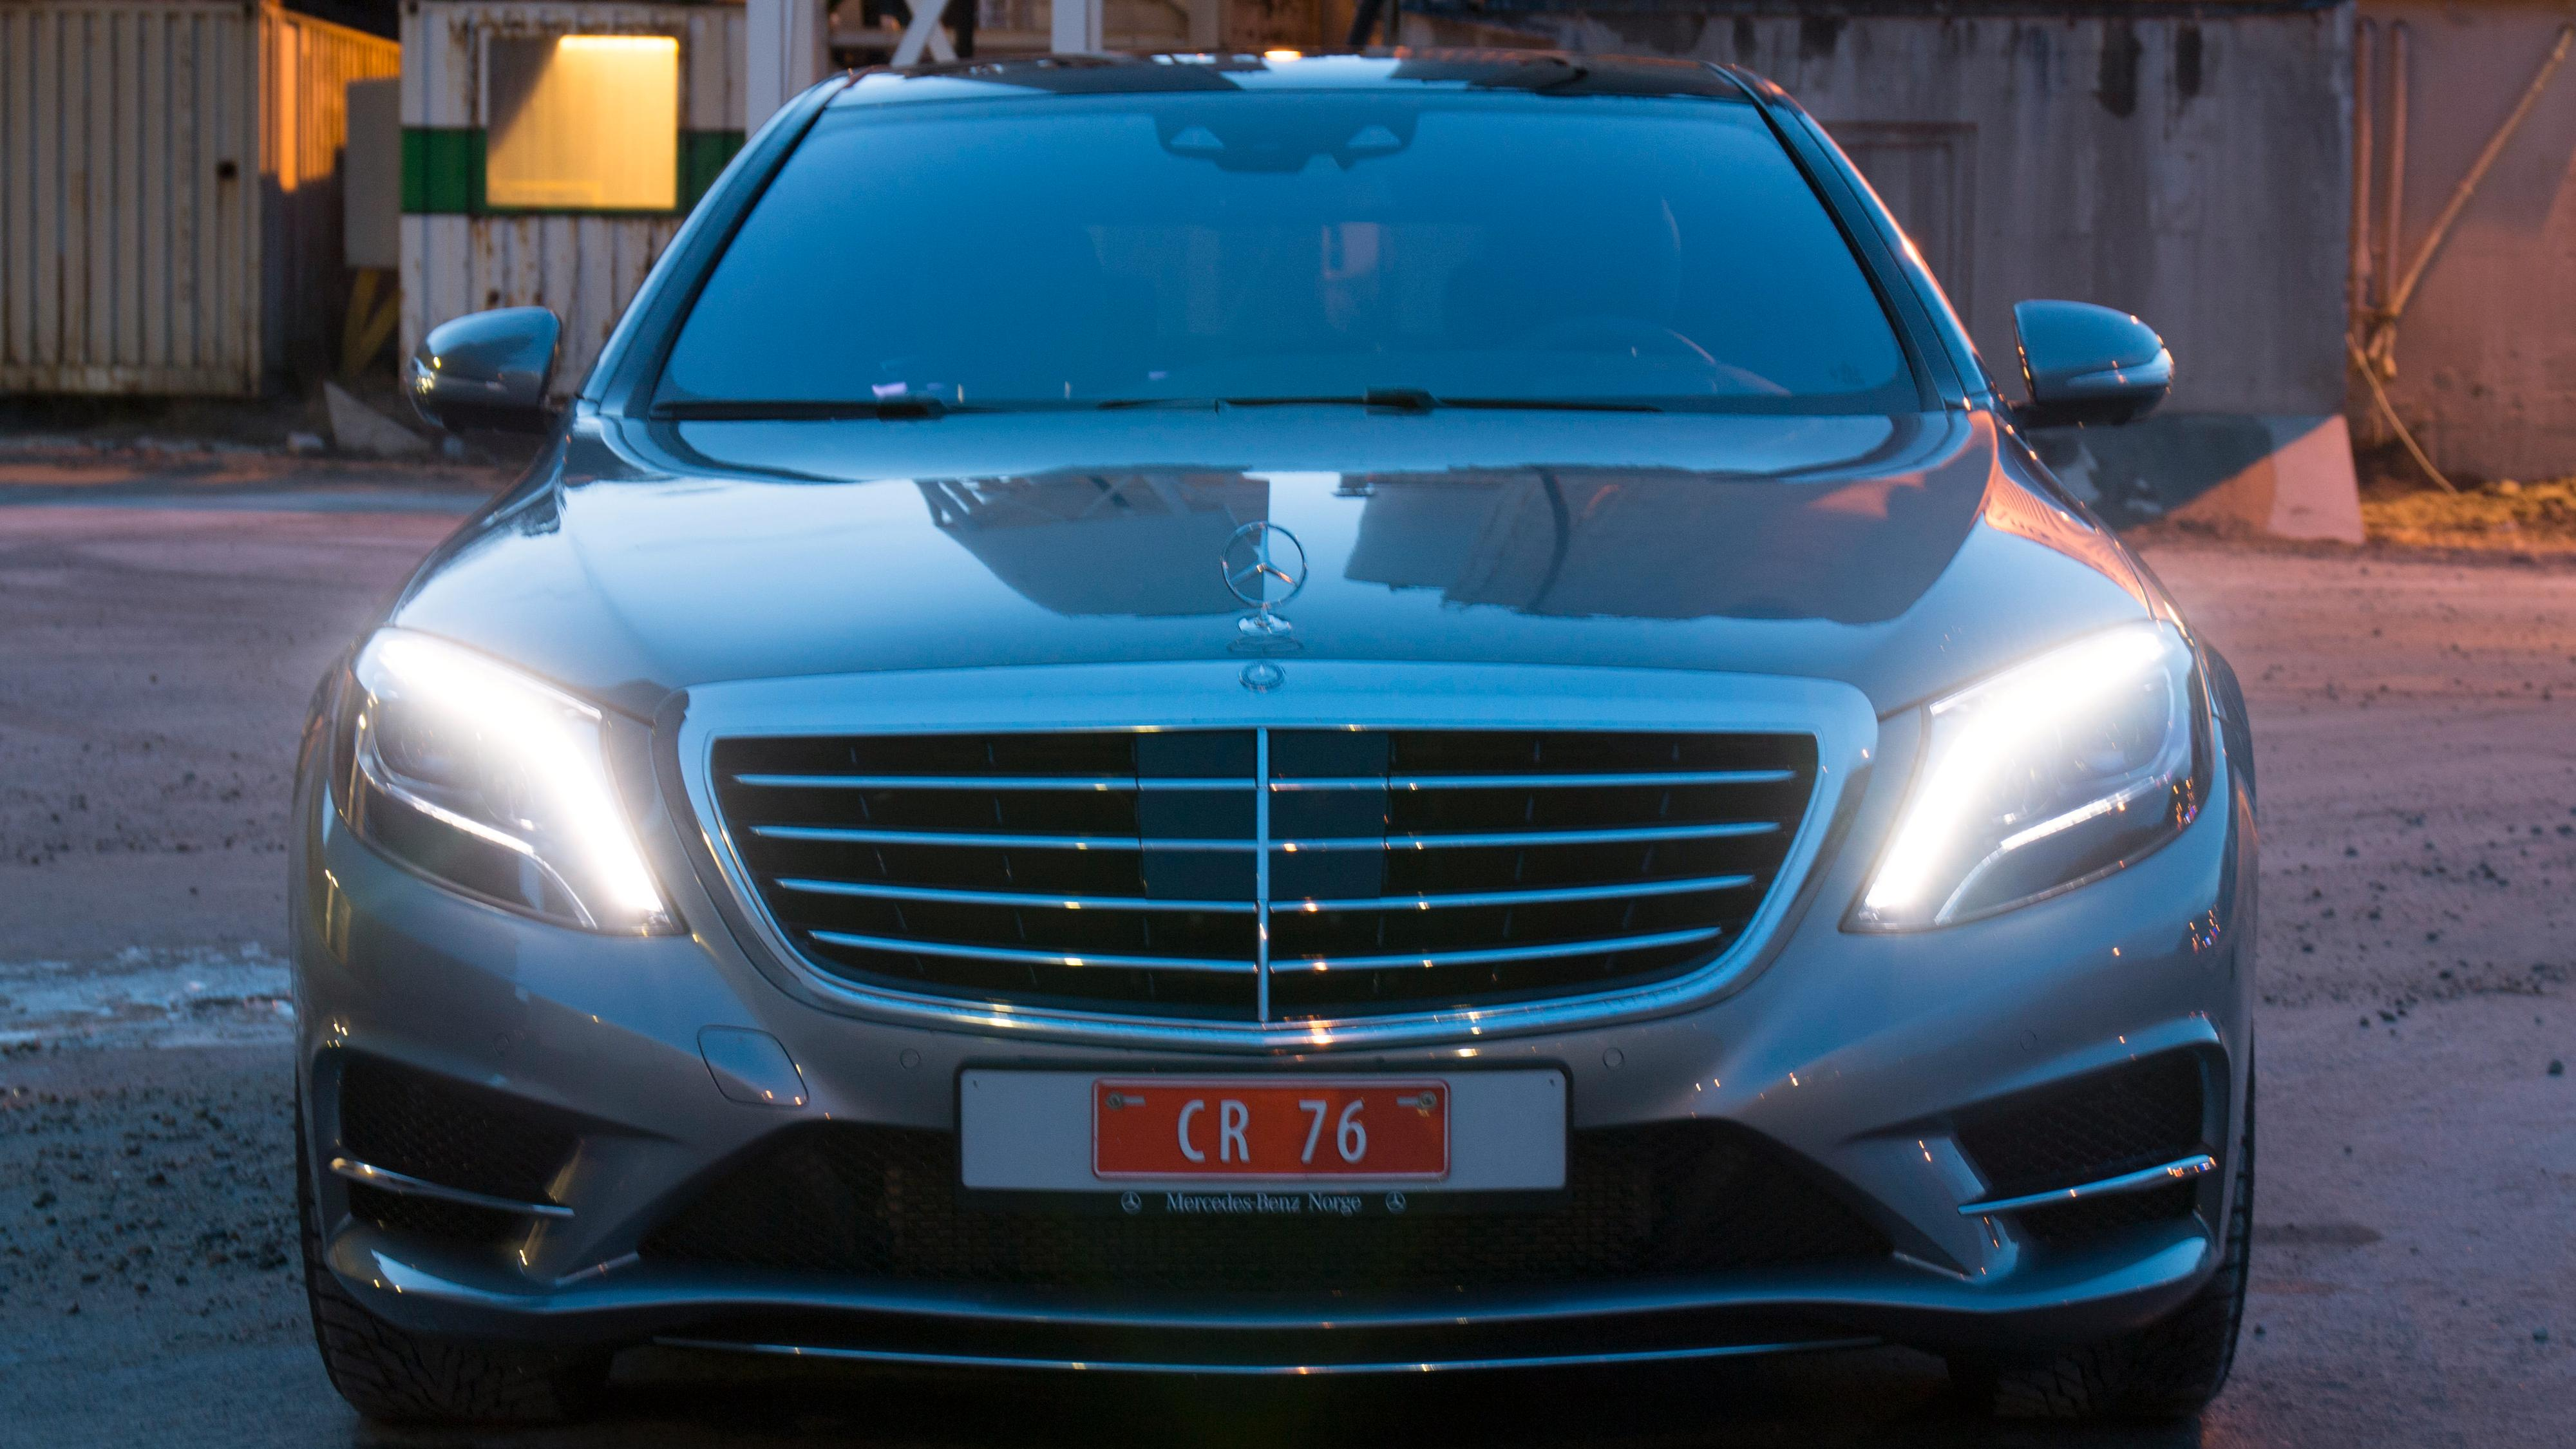 Mercedes Benz S500 Plug-in Hybrid